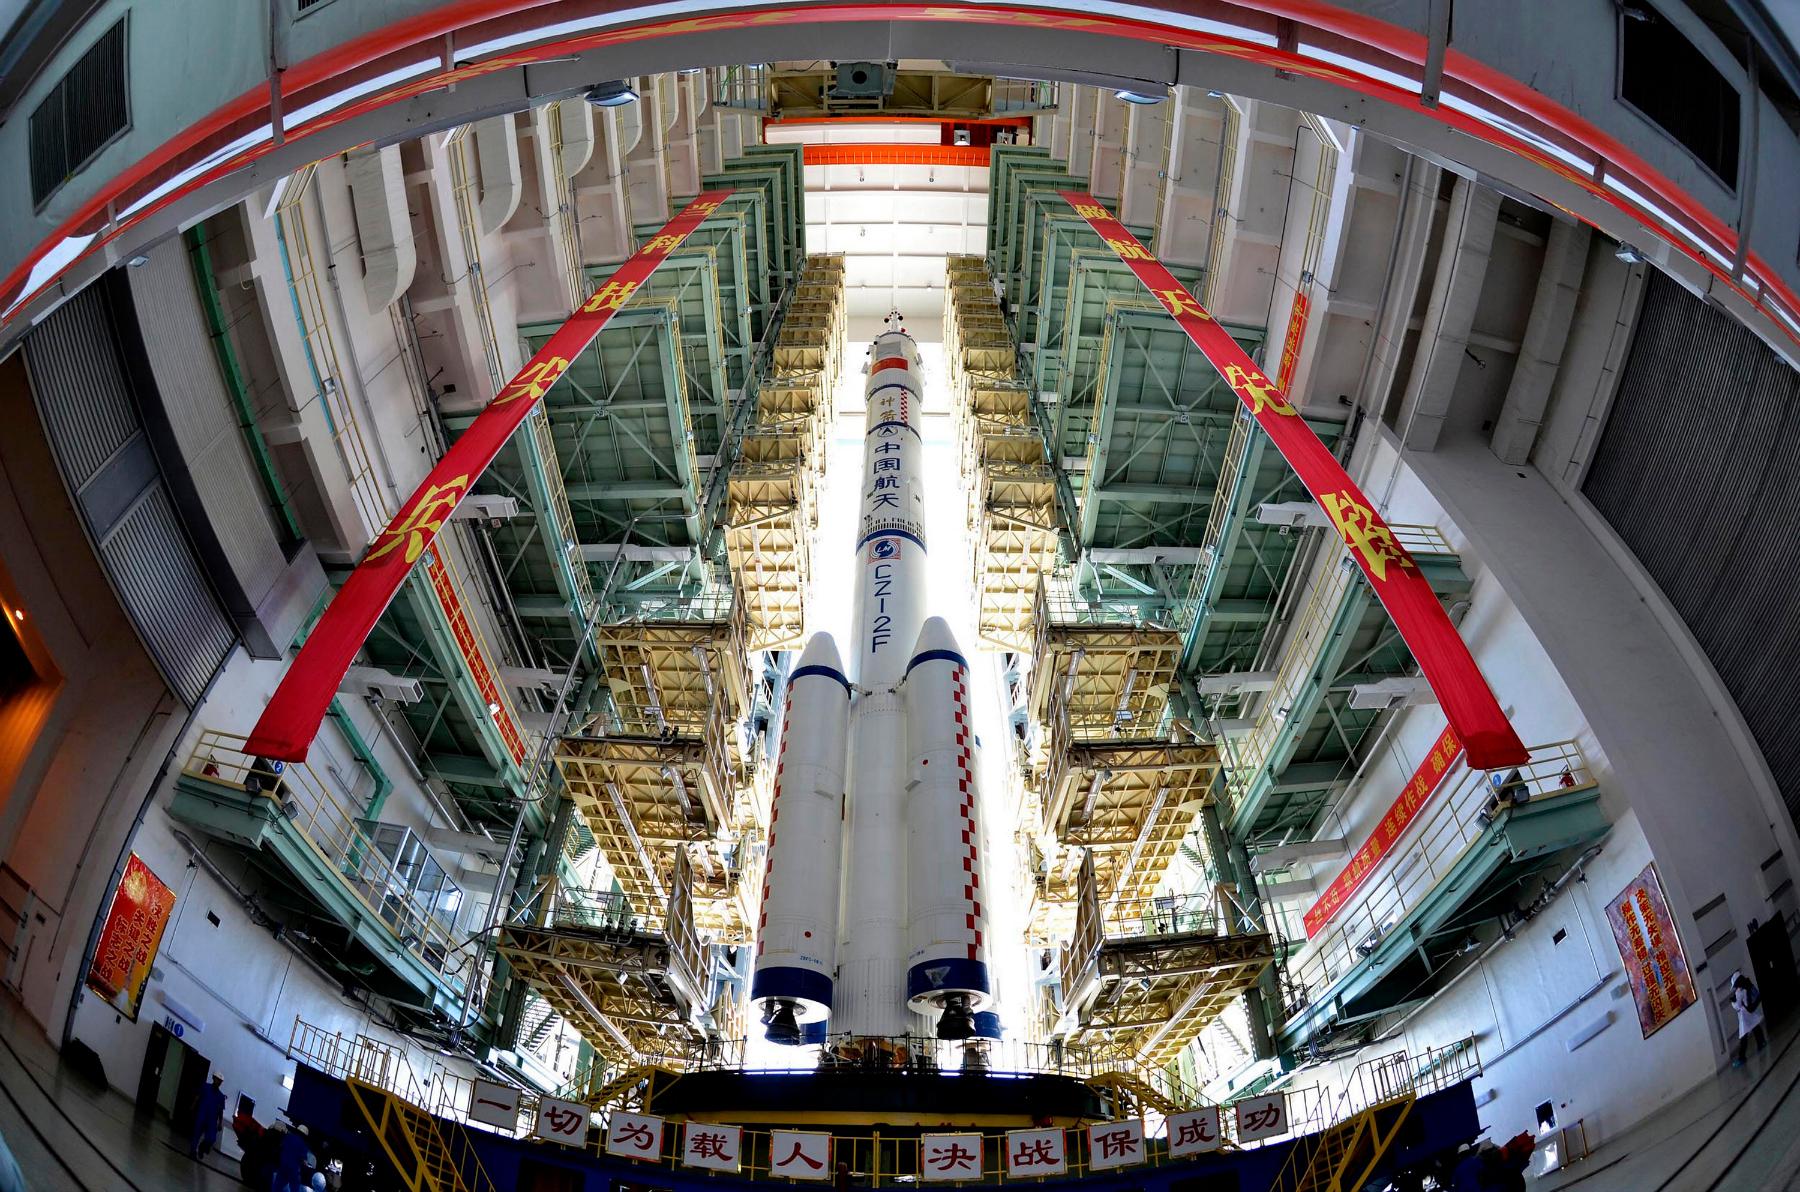 The Shenzhou-9 manned spacecraft